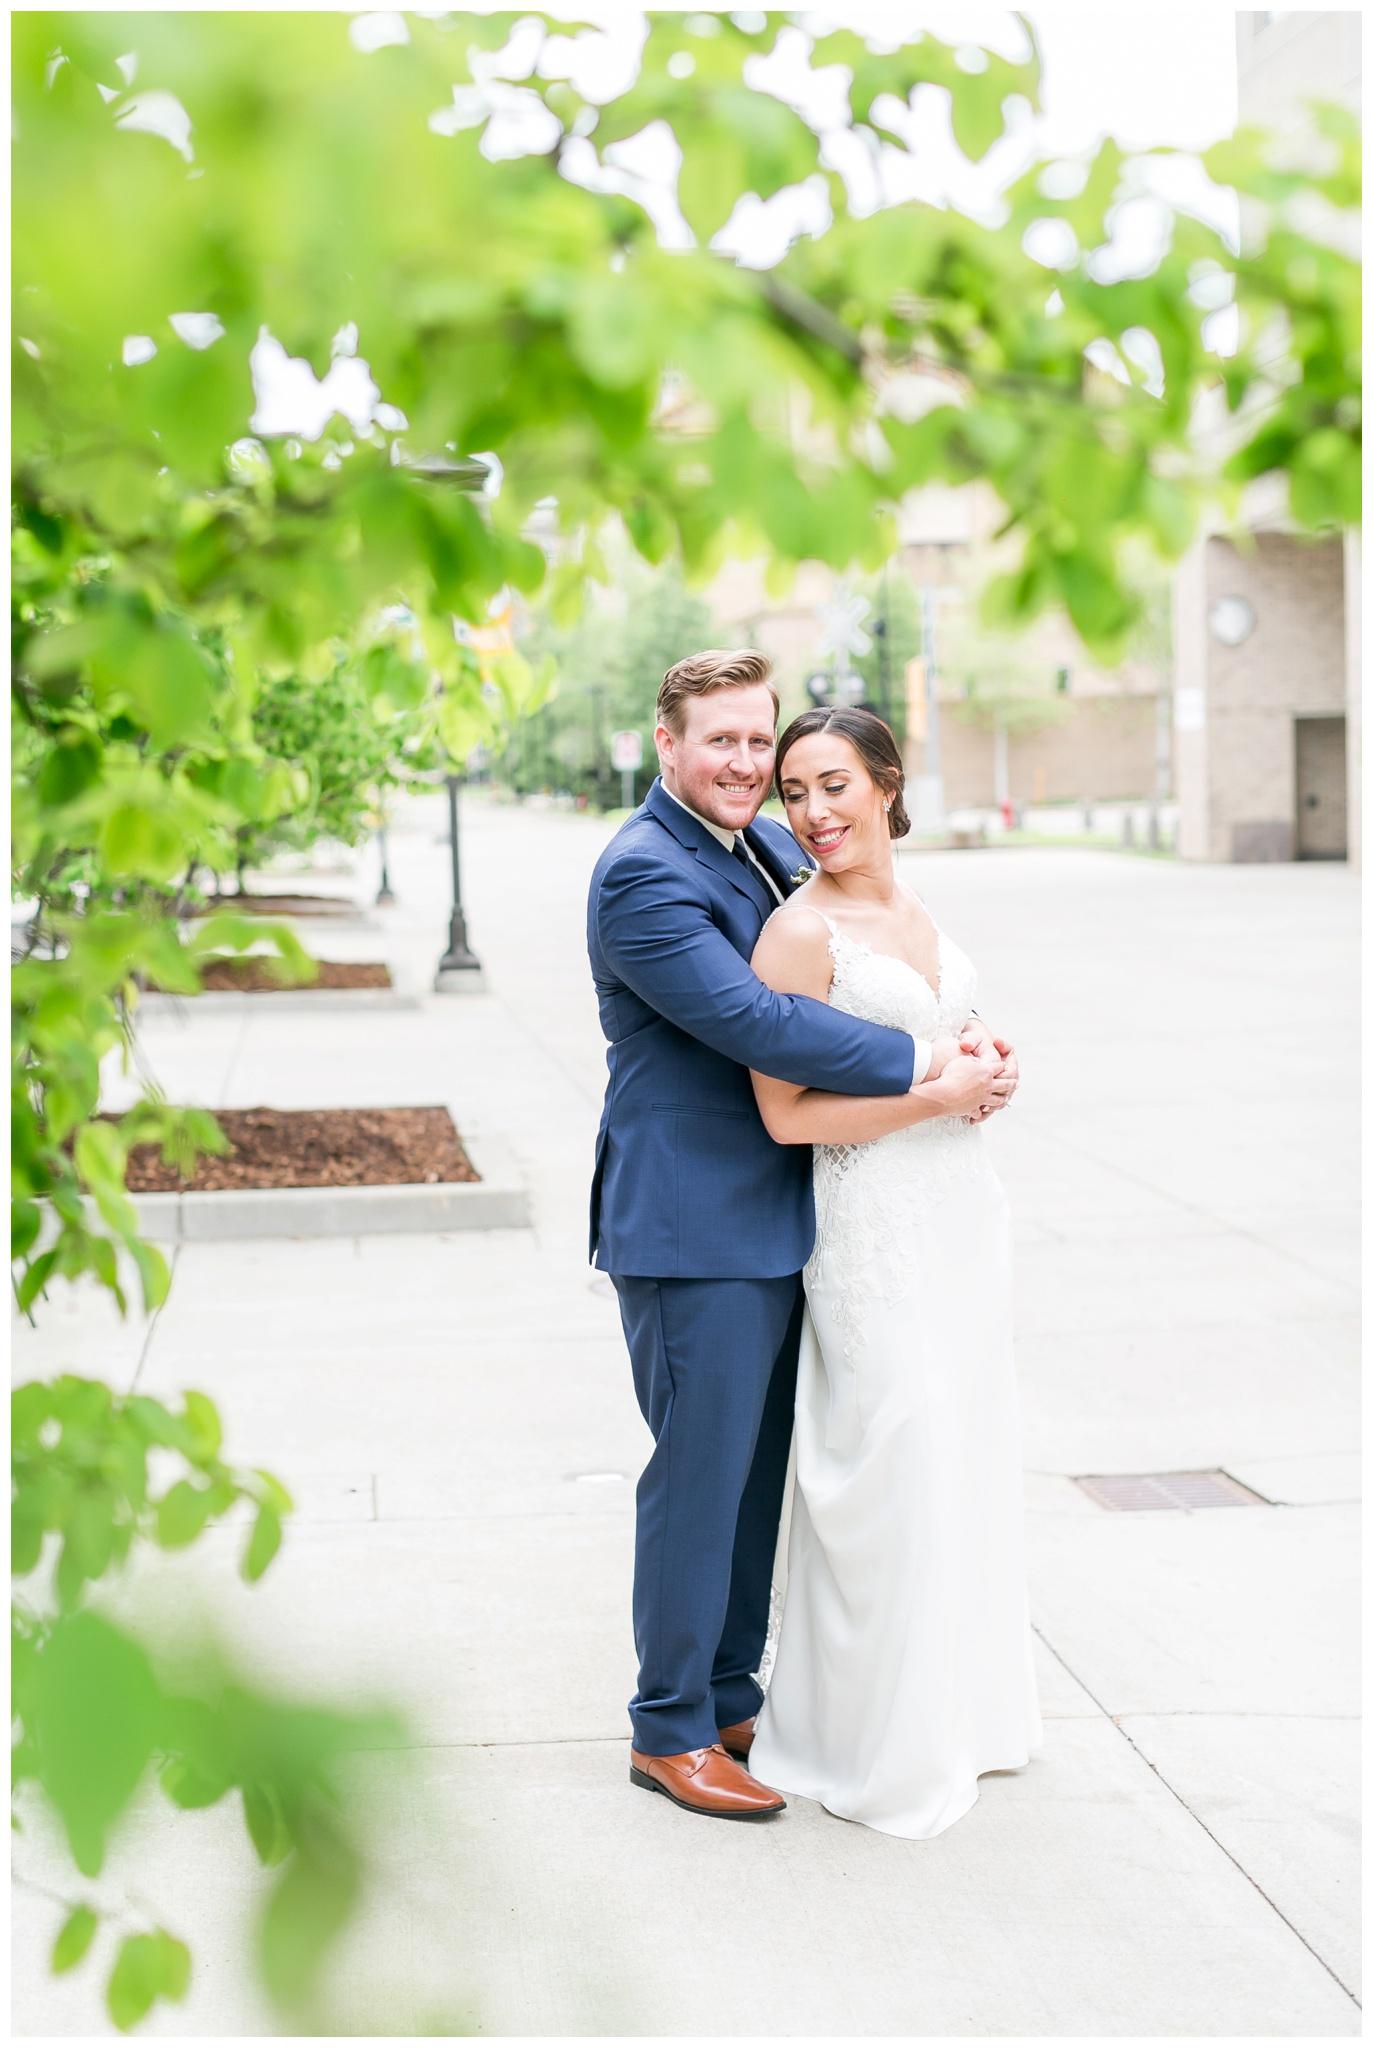 Union_south_Wedding_Madison_Wisconsin_Caynay_Photo_3681.jpg